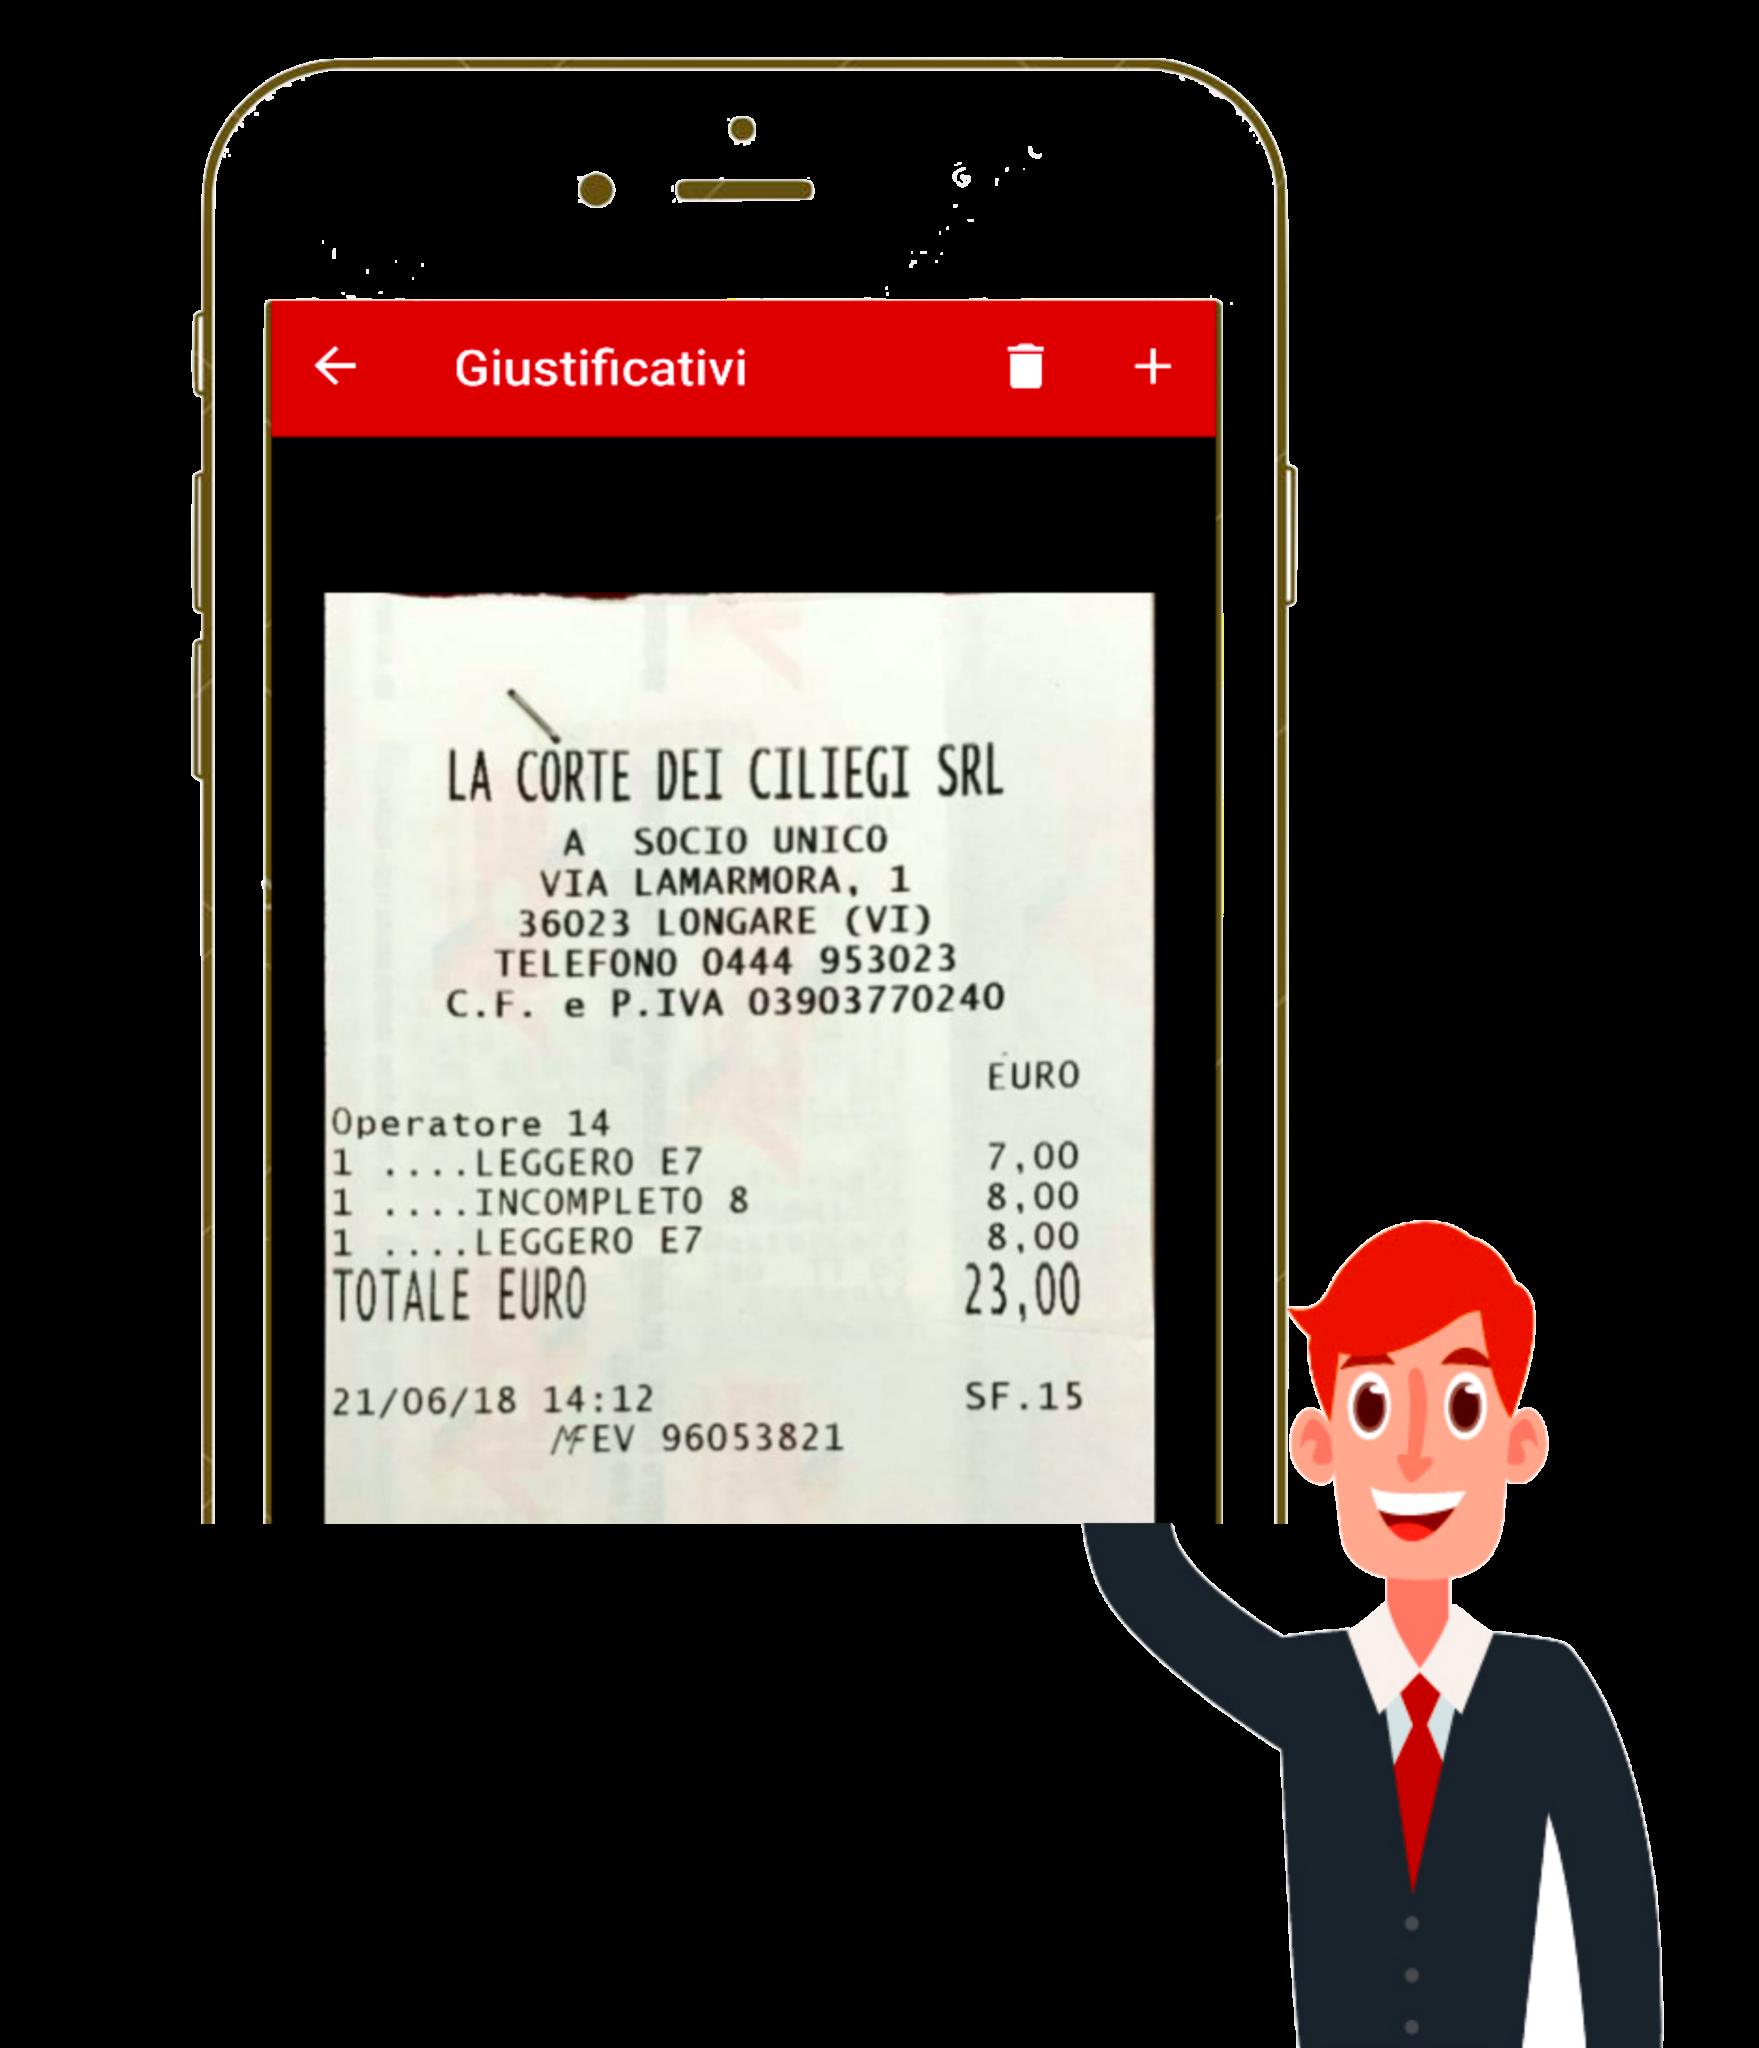 Compila la nota spese